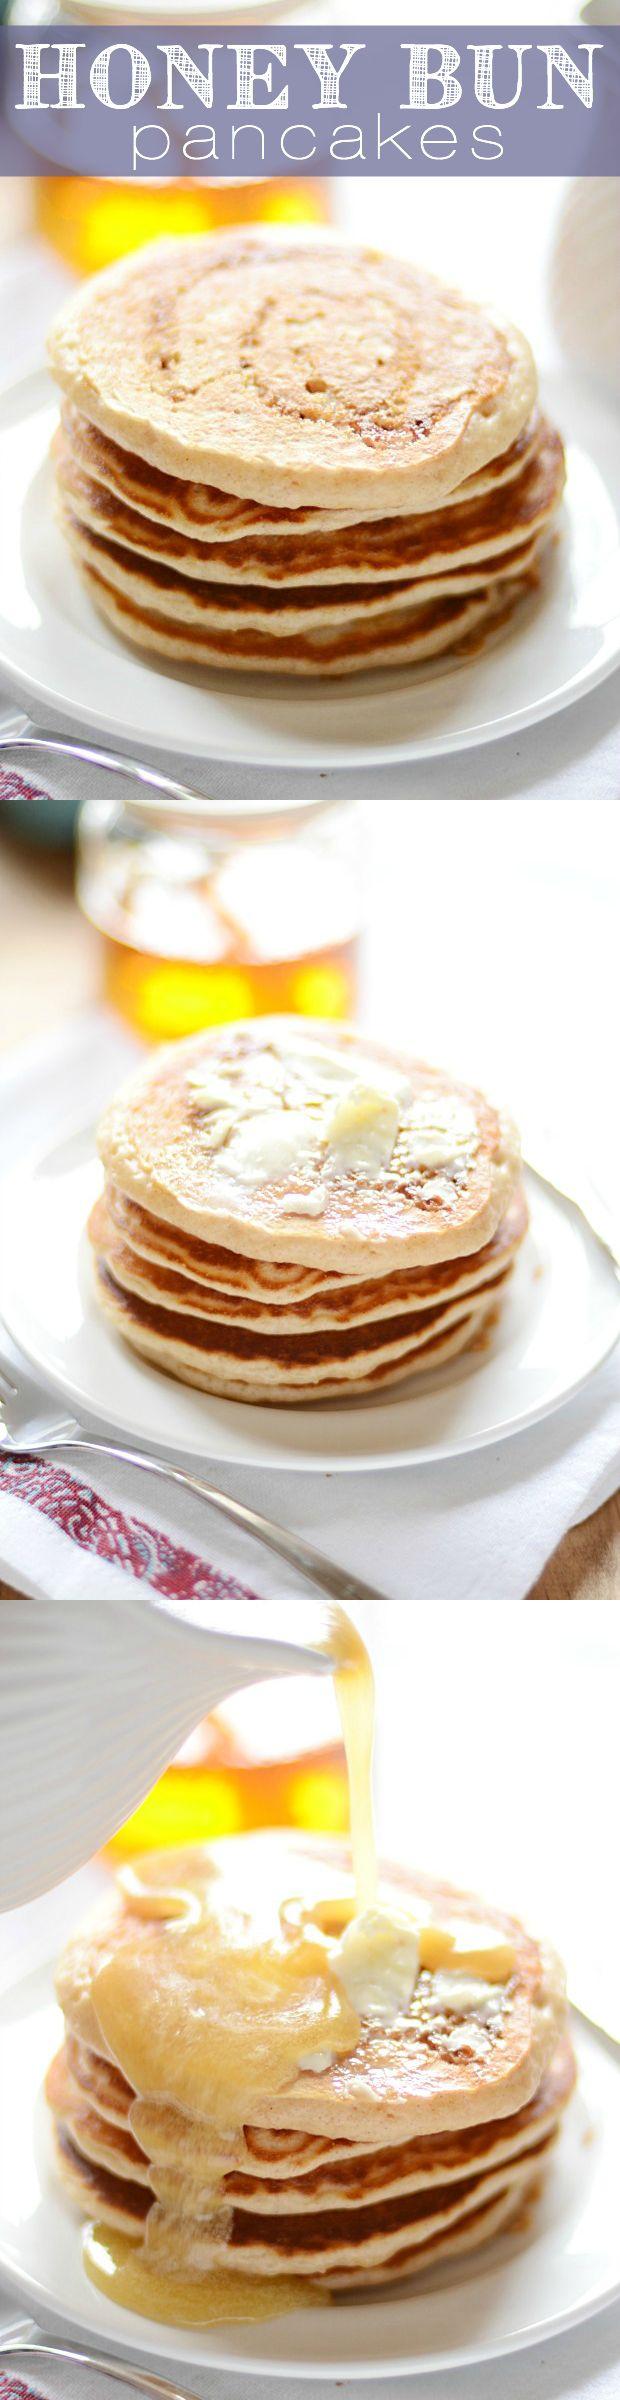 Honey Bun Pancakes | somethingswanky.com